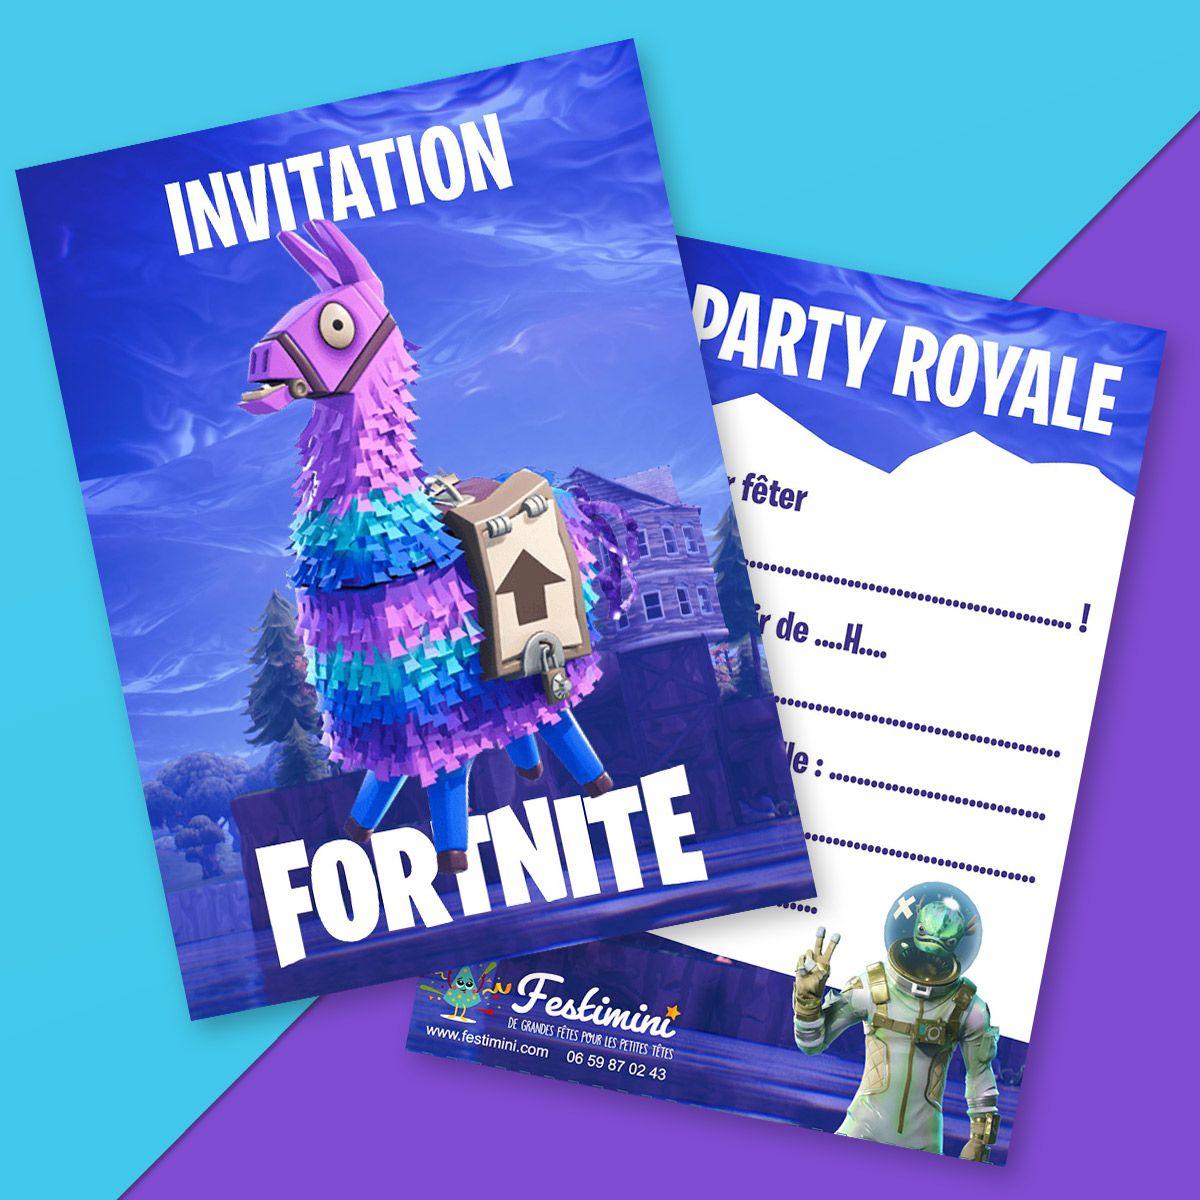 Imprimez vos invitations d'anniversaires   Invitation anniversaire, Decoration anniversaire ...